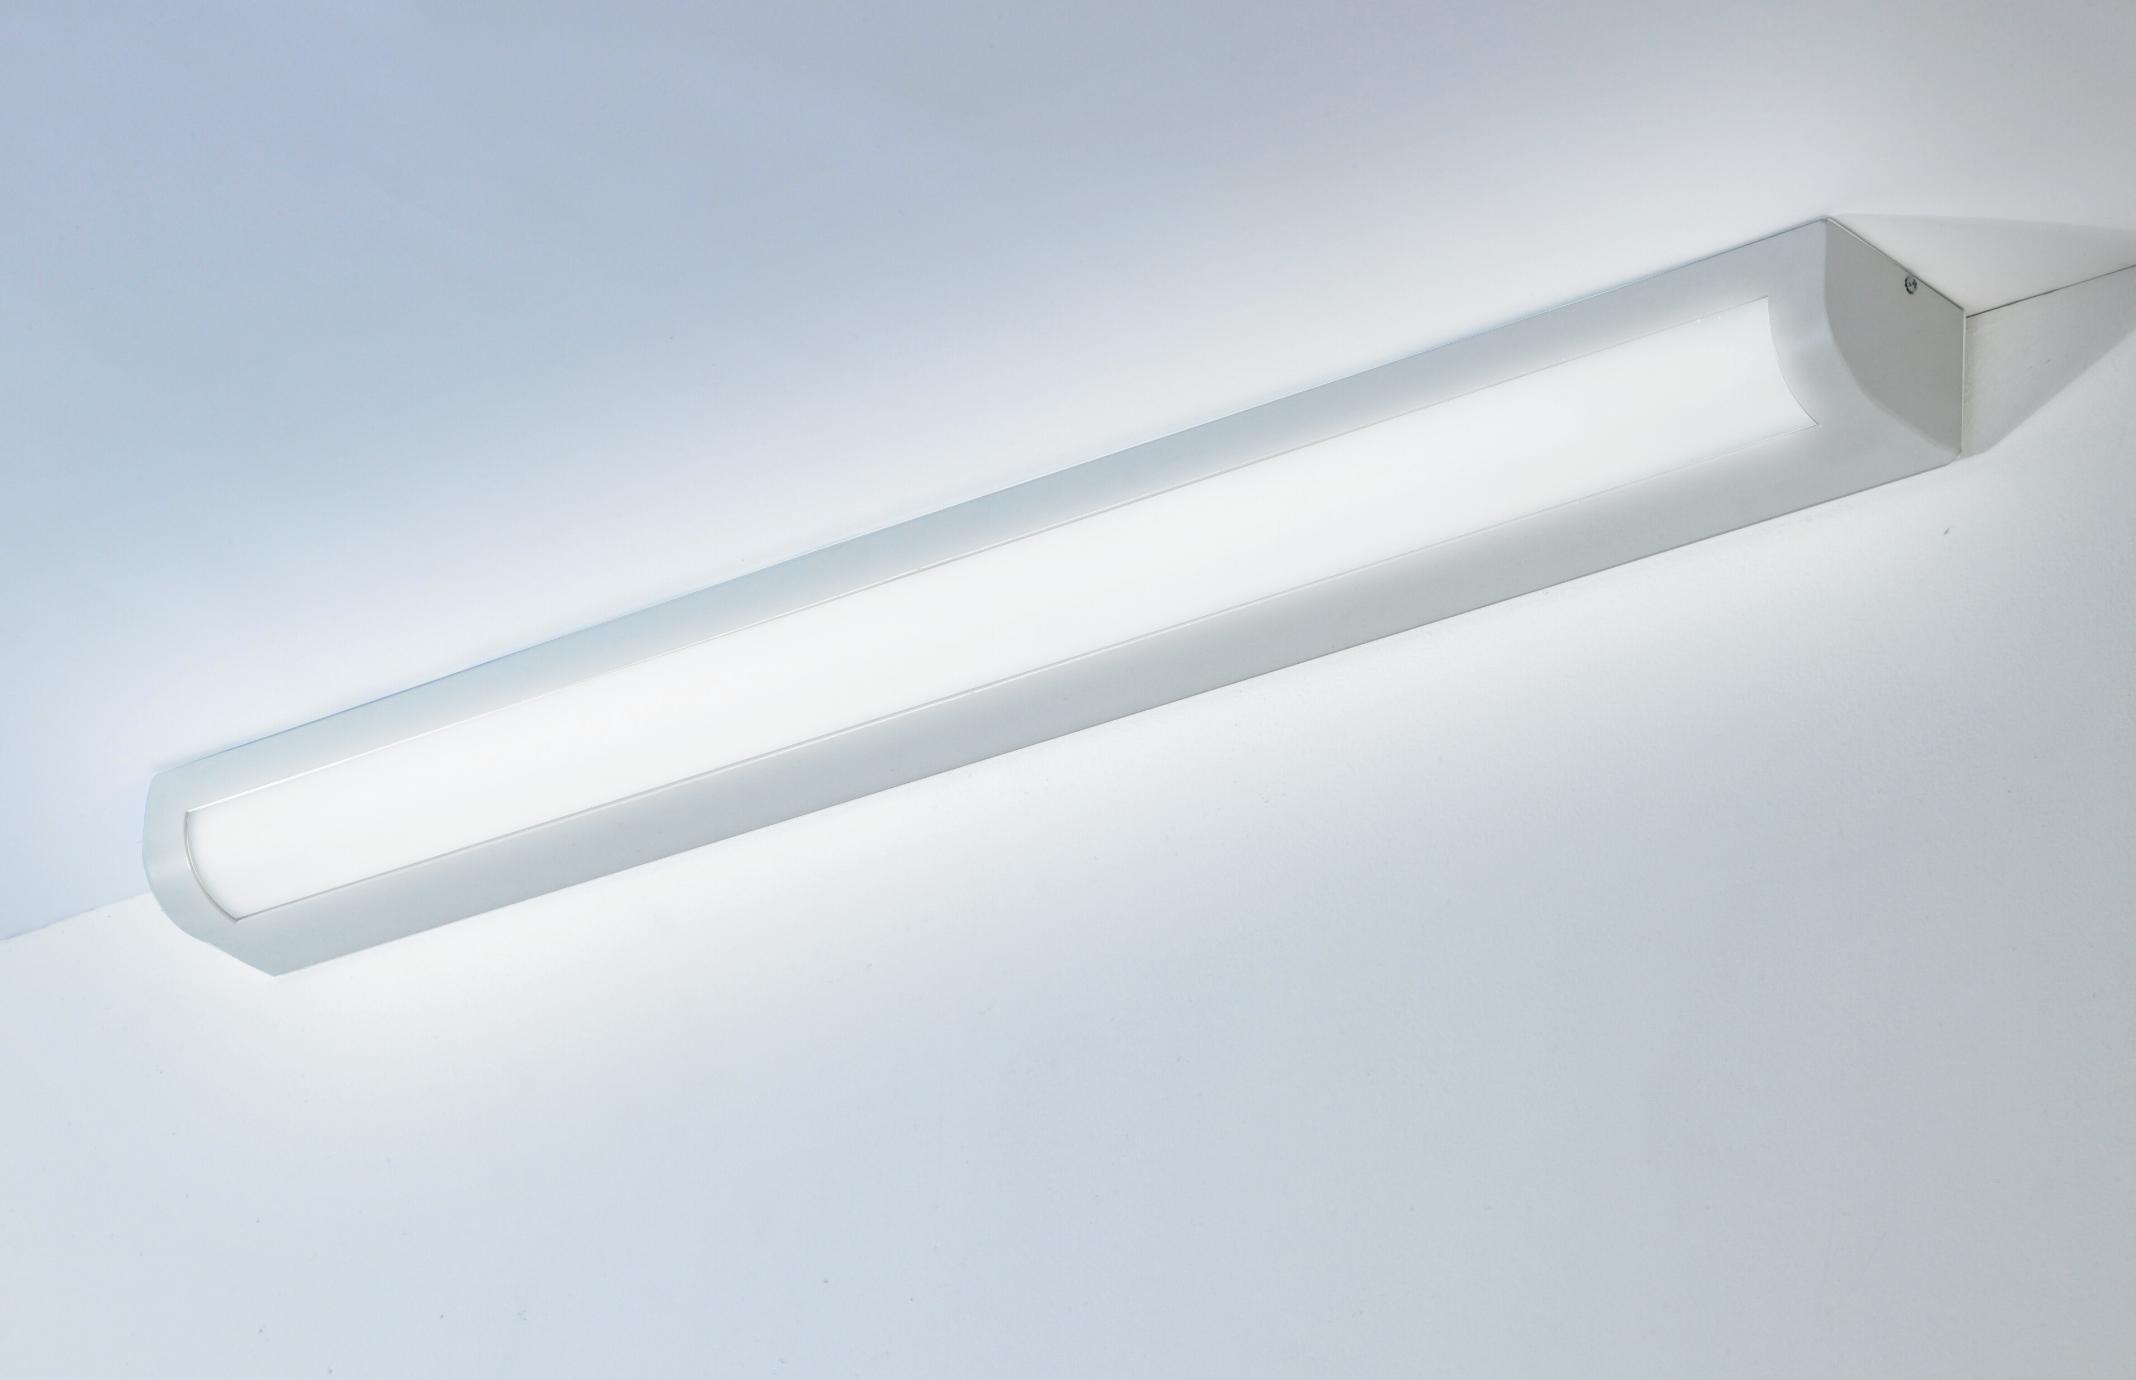 Implication Of Fluorescent Light